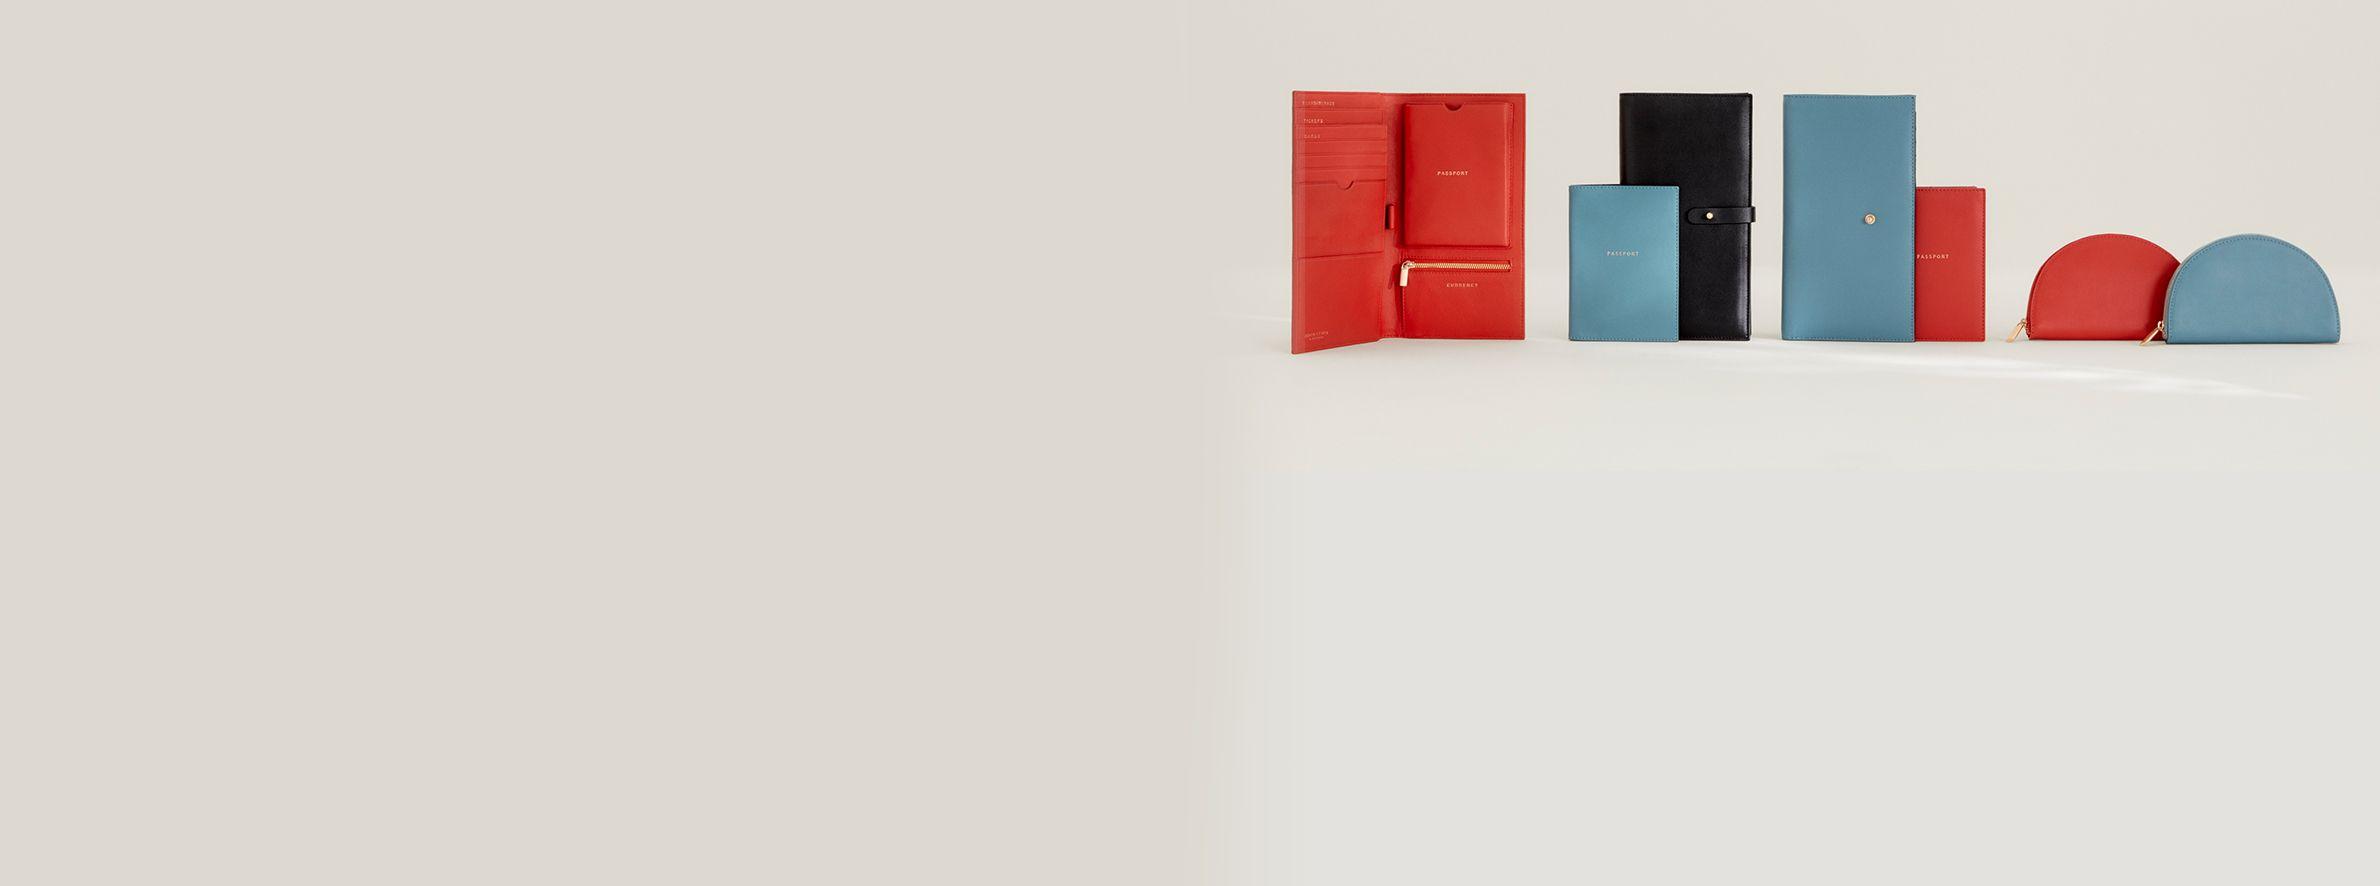 725947e16550 Women's Purses & Wallets   Bags   John Lewis & Partners